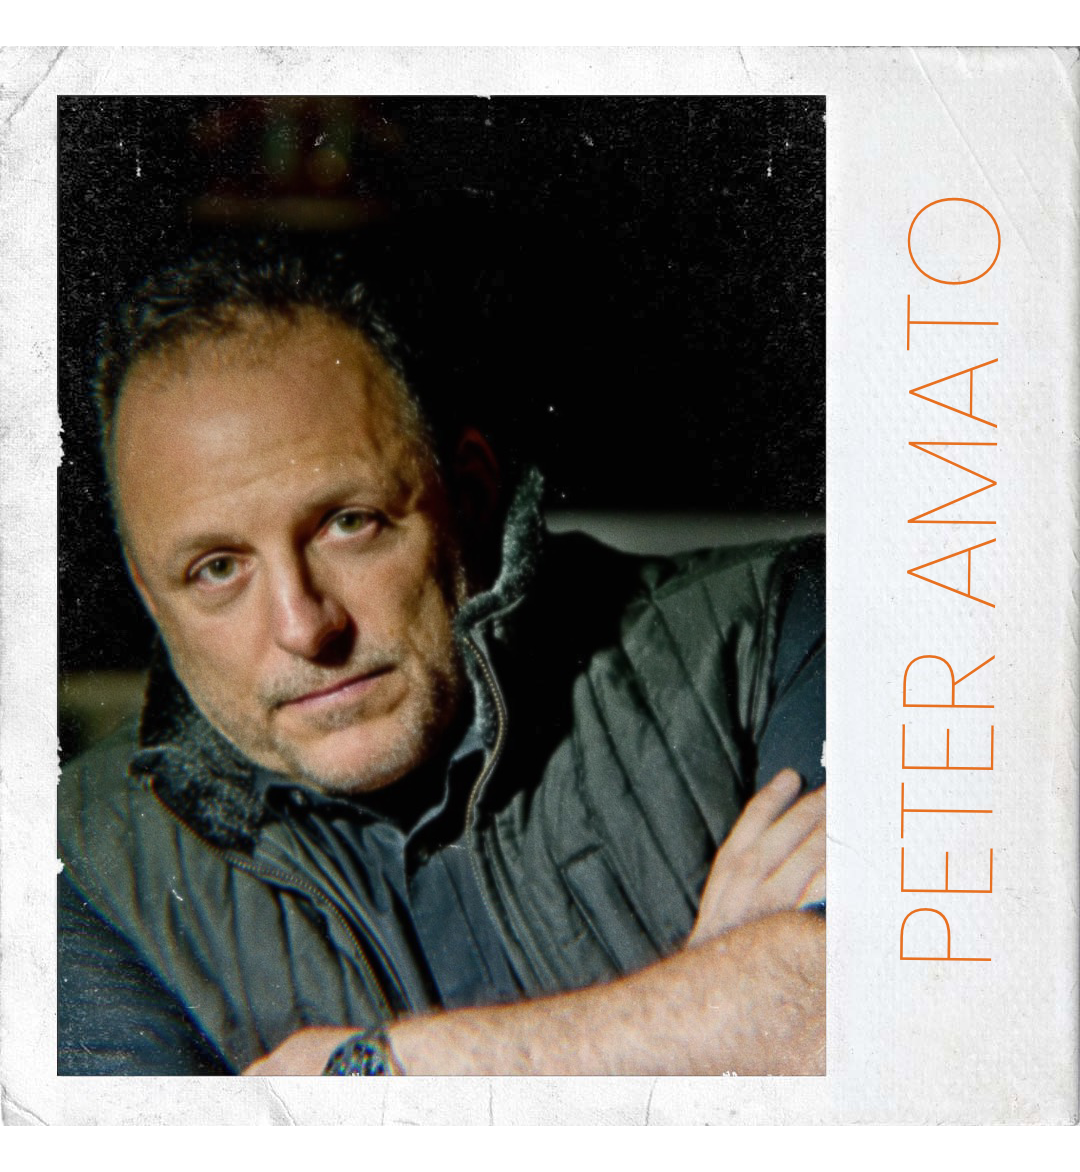 Peter Amato